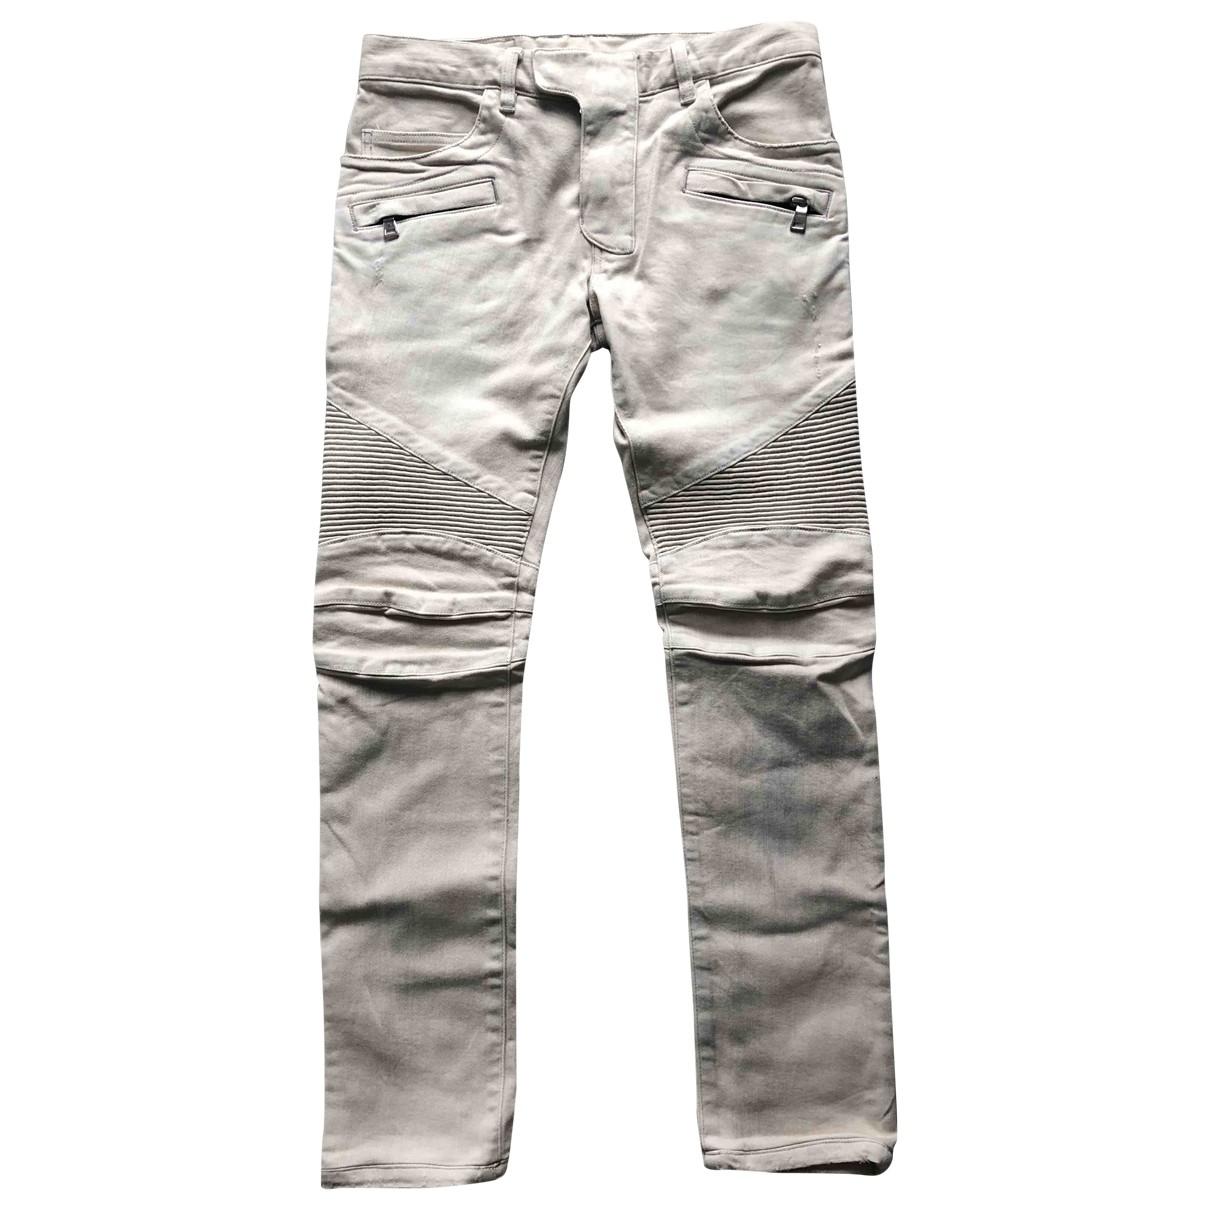 Balmain \N Beige Cotton - elasthane Jeans for Men 30 US